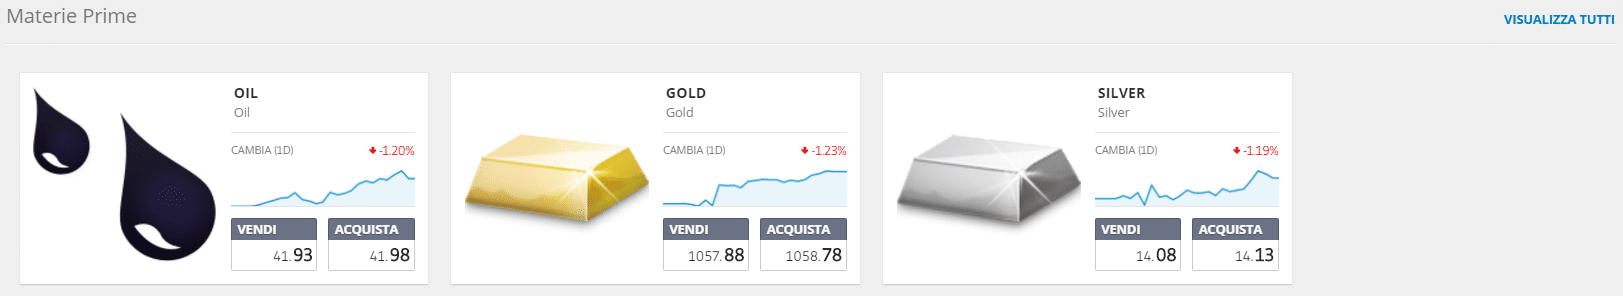 trading etoro materie prime